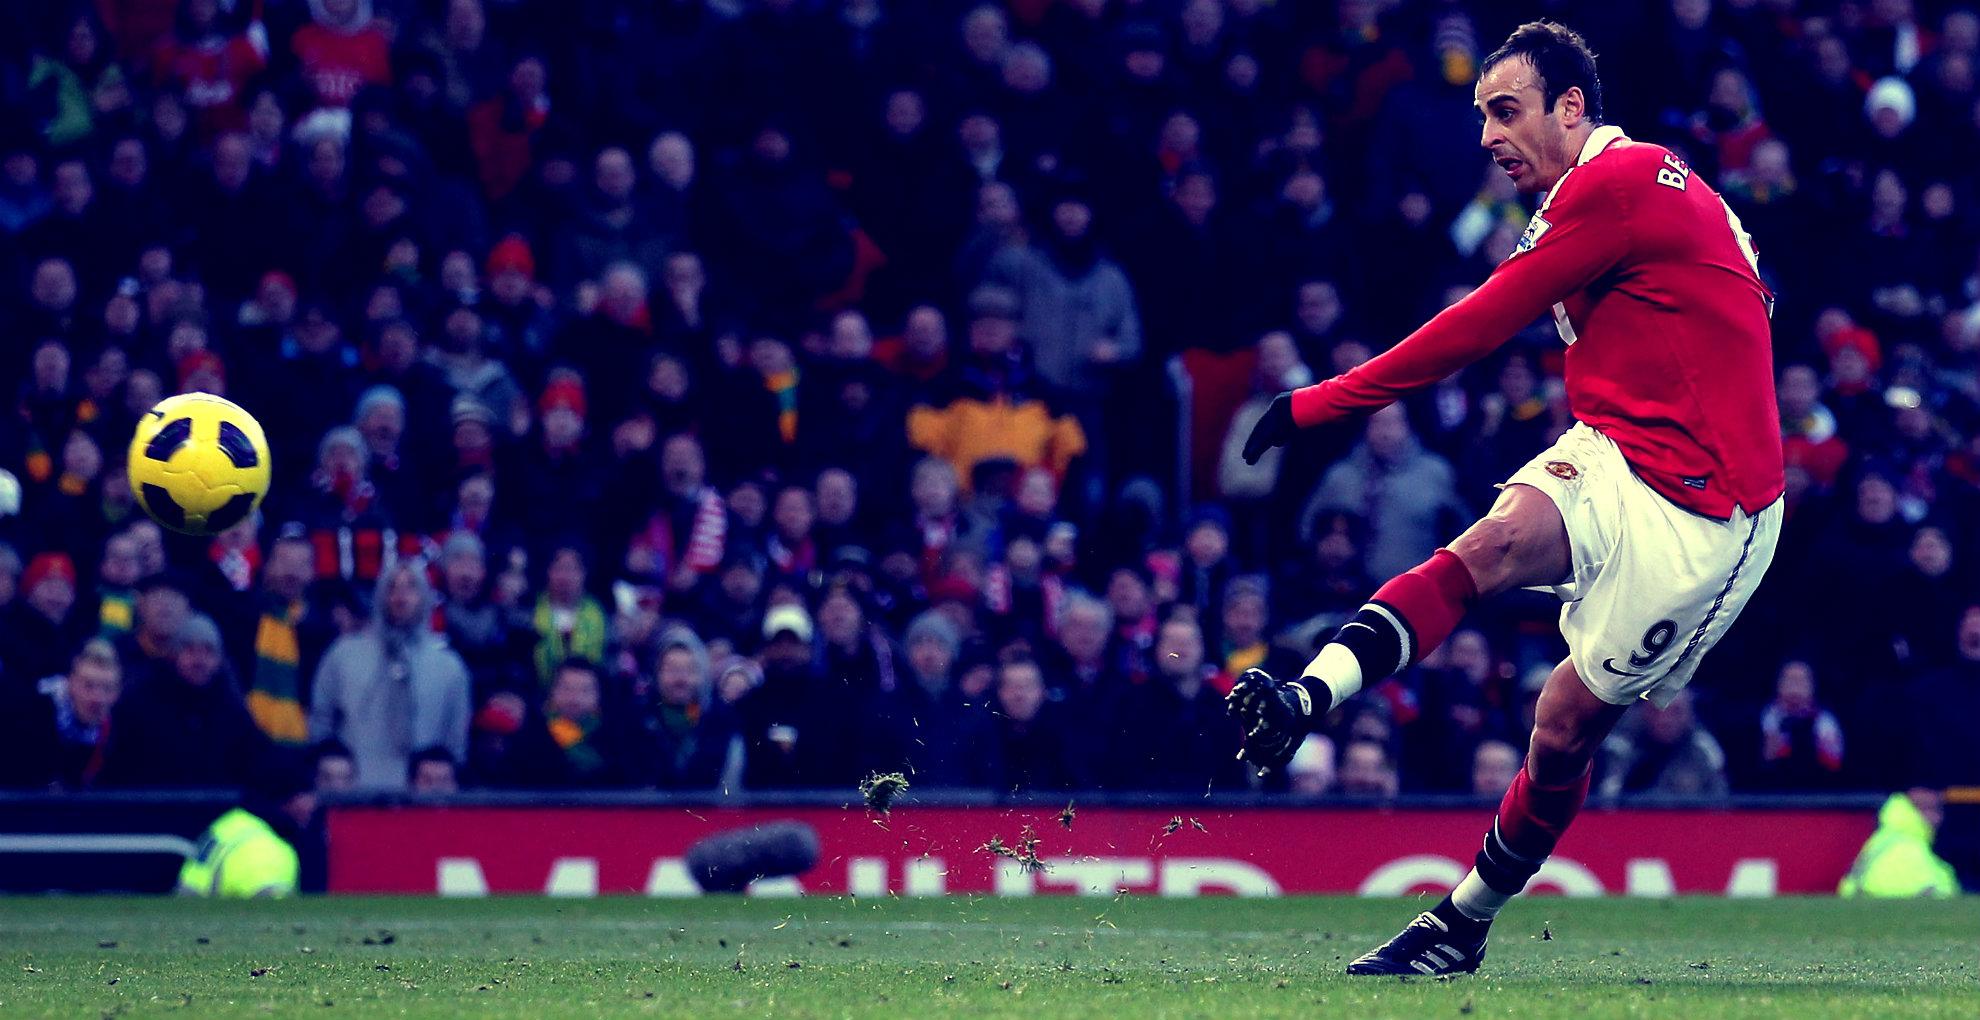 5 Pemain Manchester United Yang Pernah Cetak 5 Gol Dalam